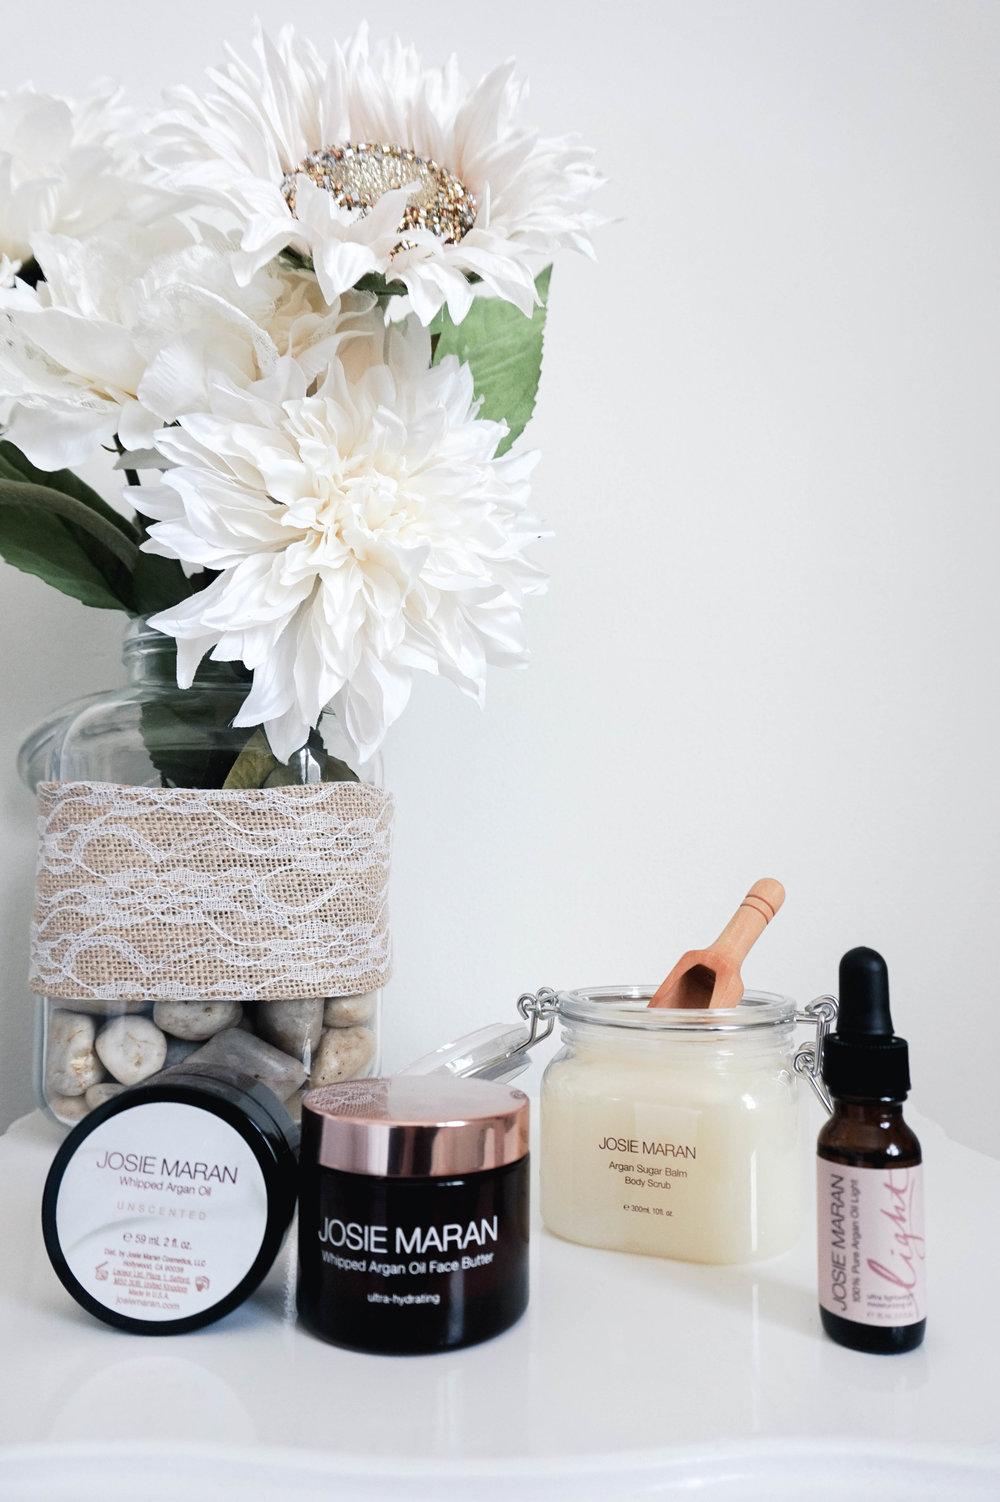 josie-maran-beauty-products.jpg